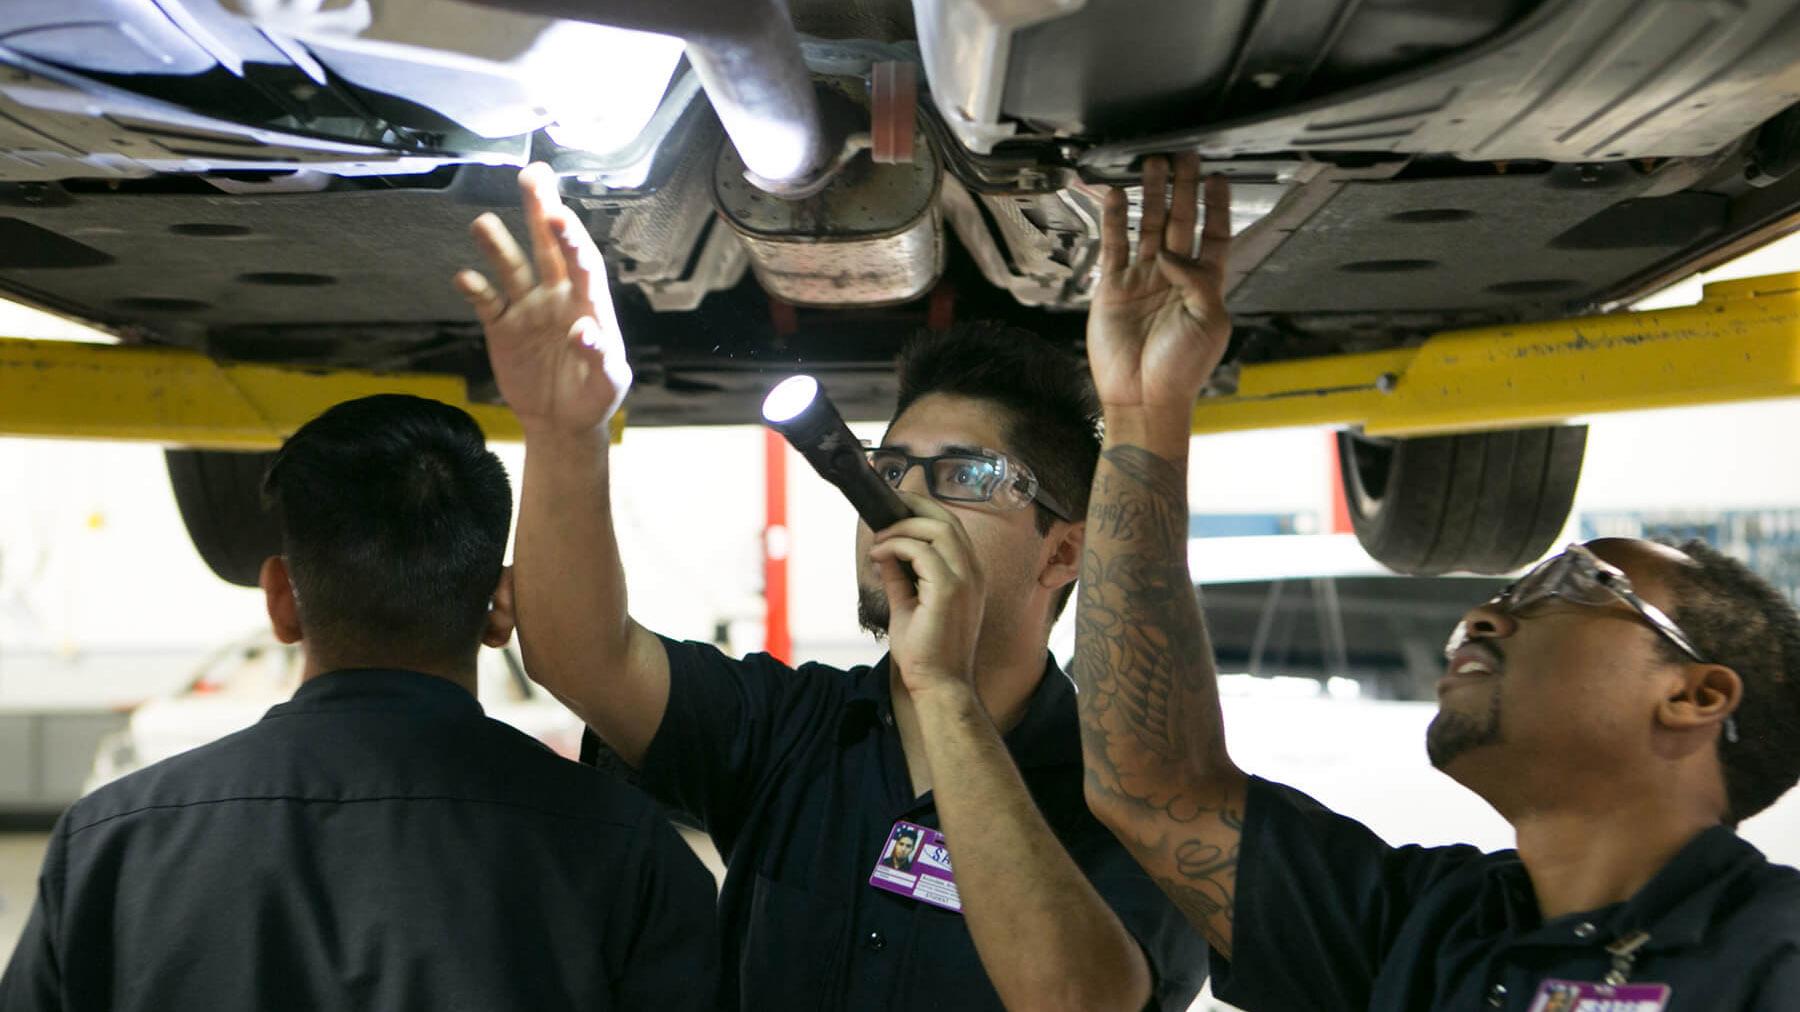 Specialized Training_4x3_Volvo_Courses_Under Car Flashlight